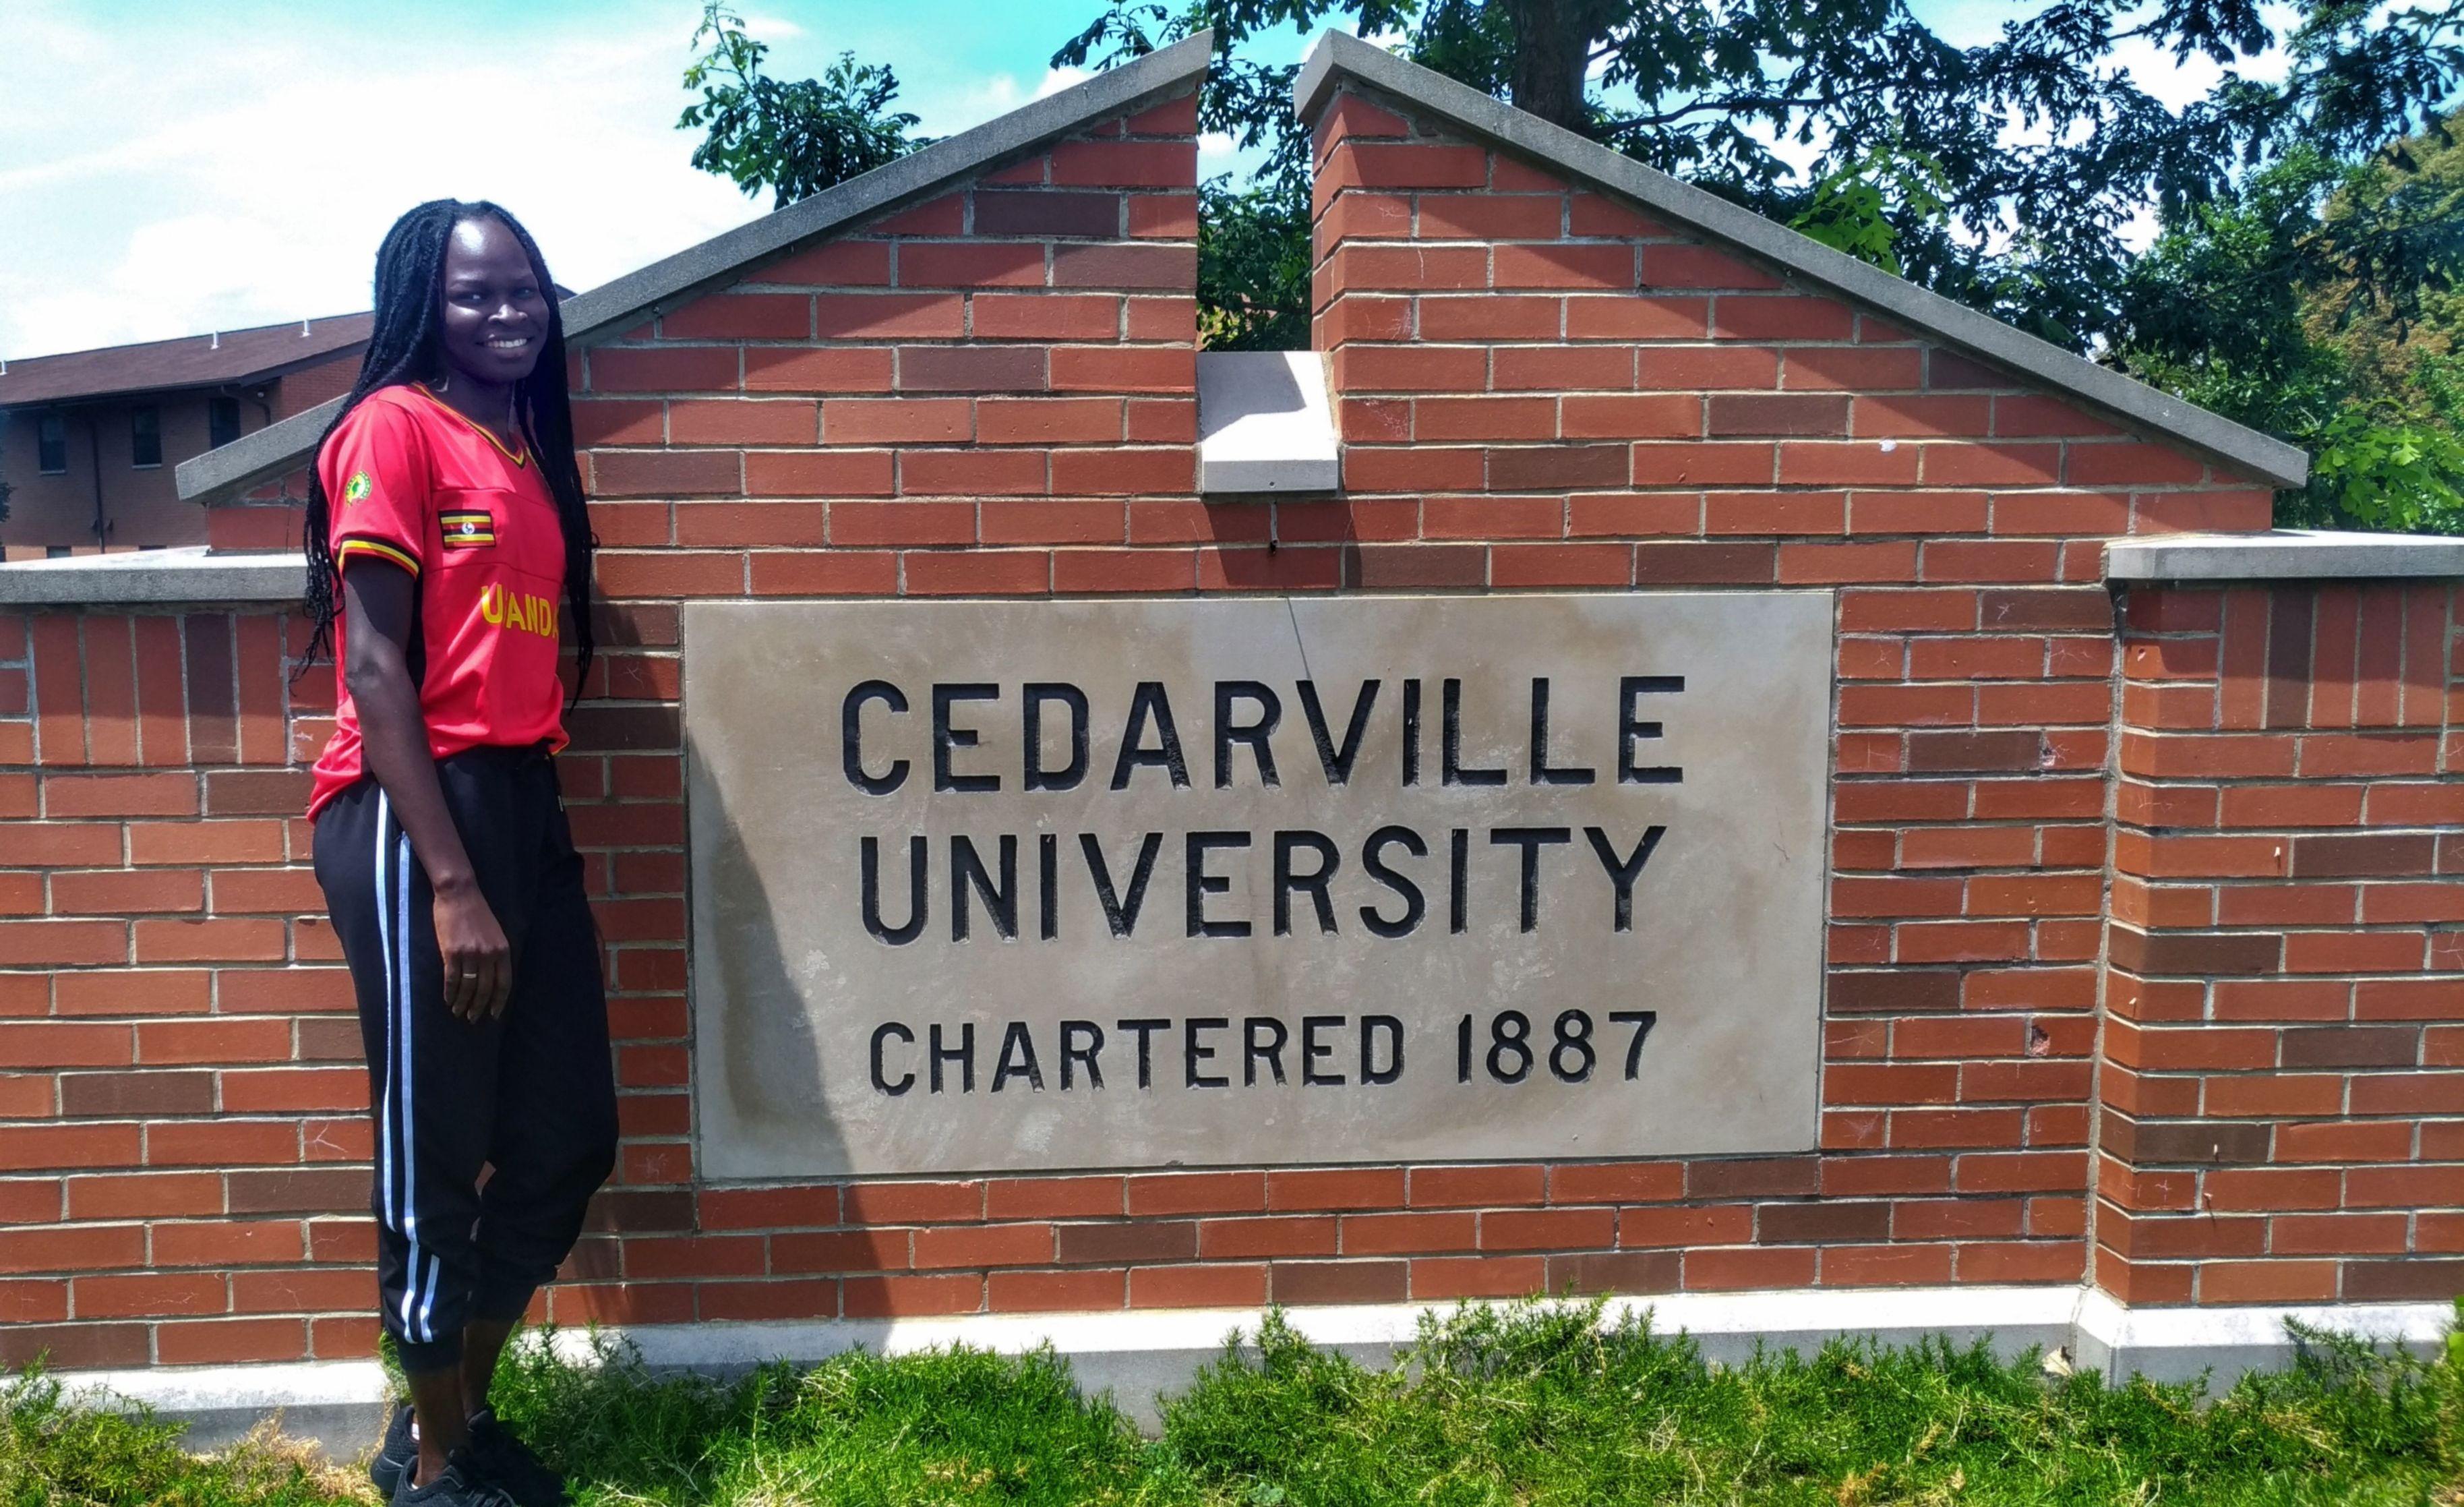 Miriam @ Cedarville University